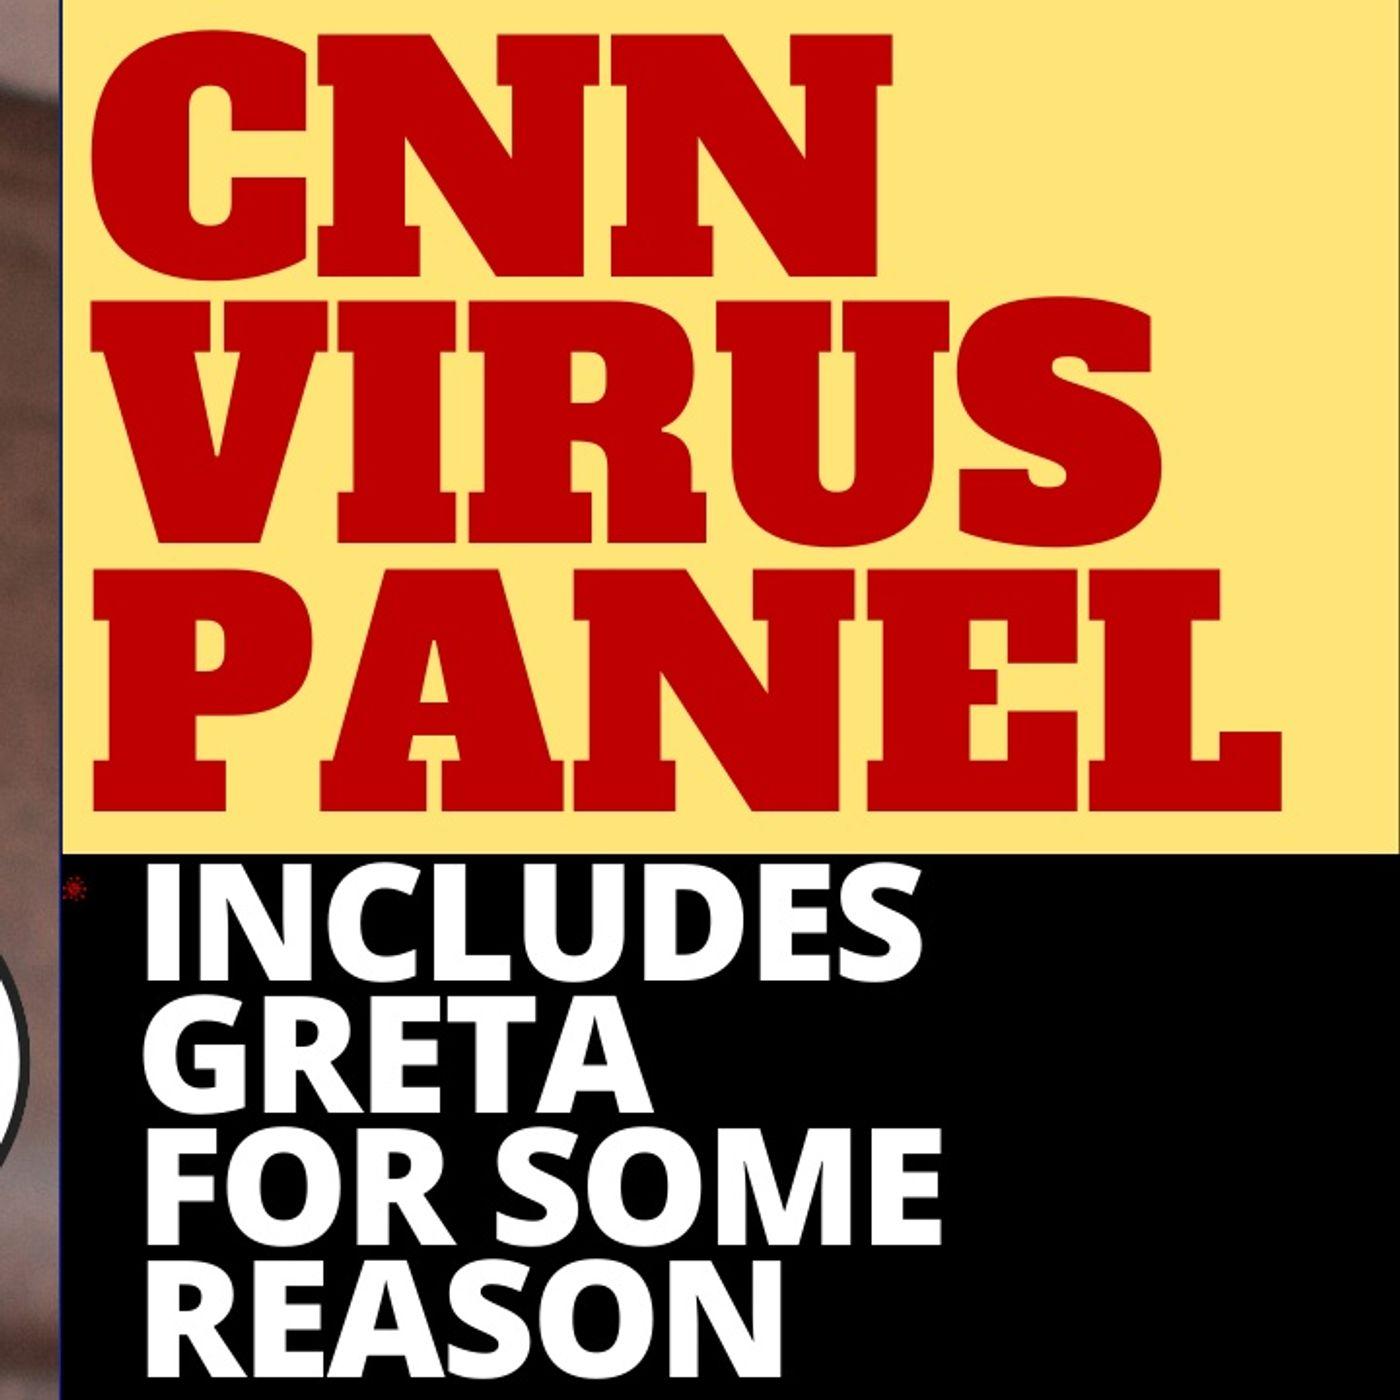 WHAT'S THE POINT OF GRETA THUNBERG ON CNN VIRUS PANEL?